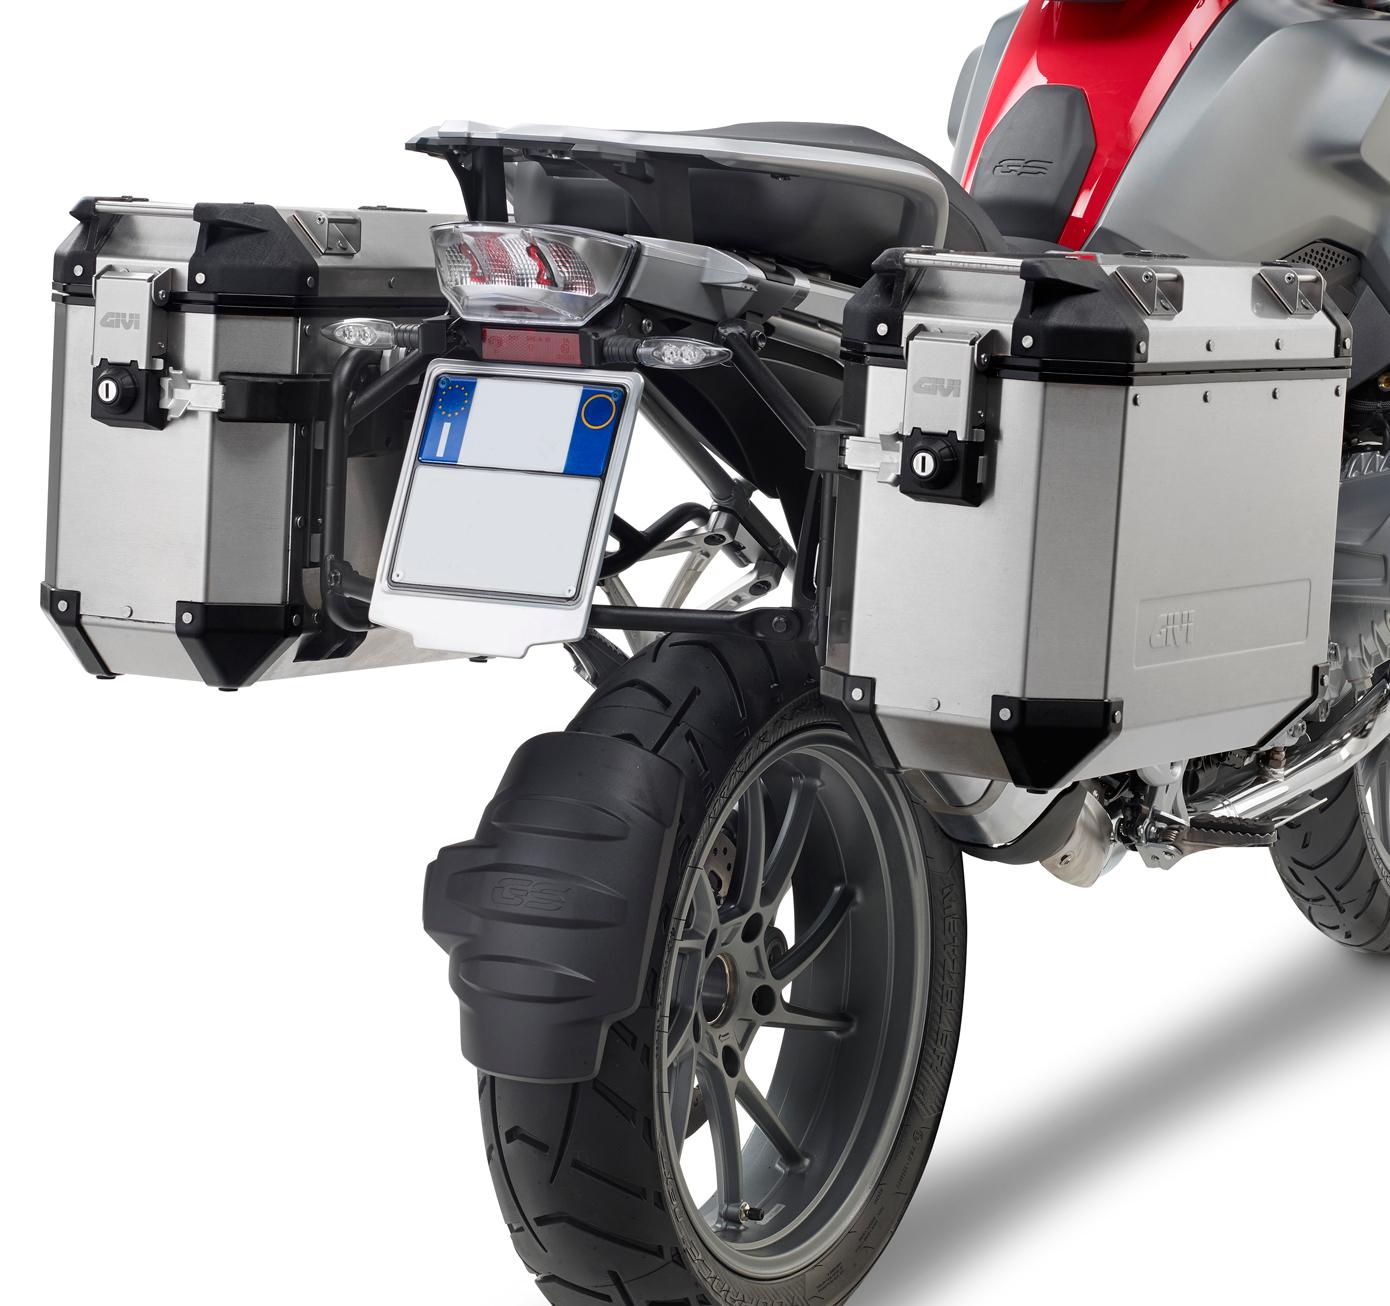 Telaietti specifici Givi PL5108CAM per Valigie Laterali Monokey Cam-Side  Trekker Outback per BMW R 1200 GS 13-18 1704bdc9b9a